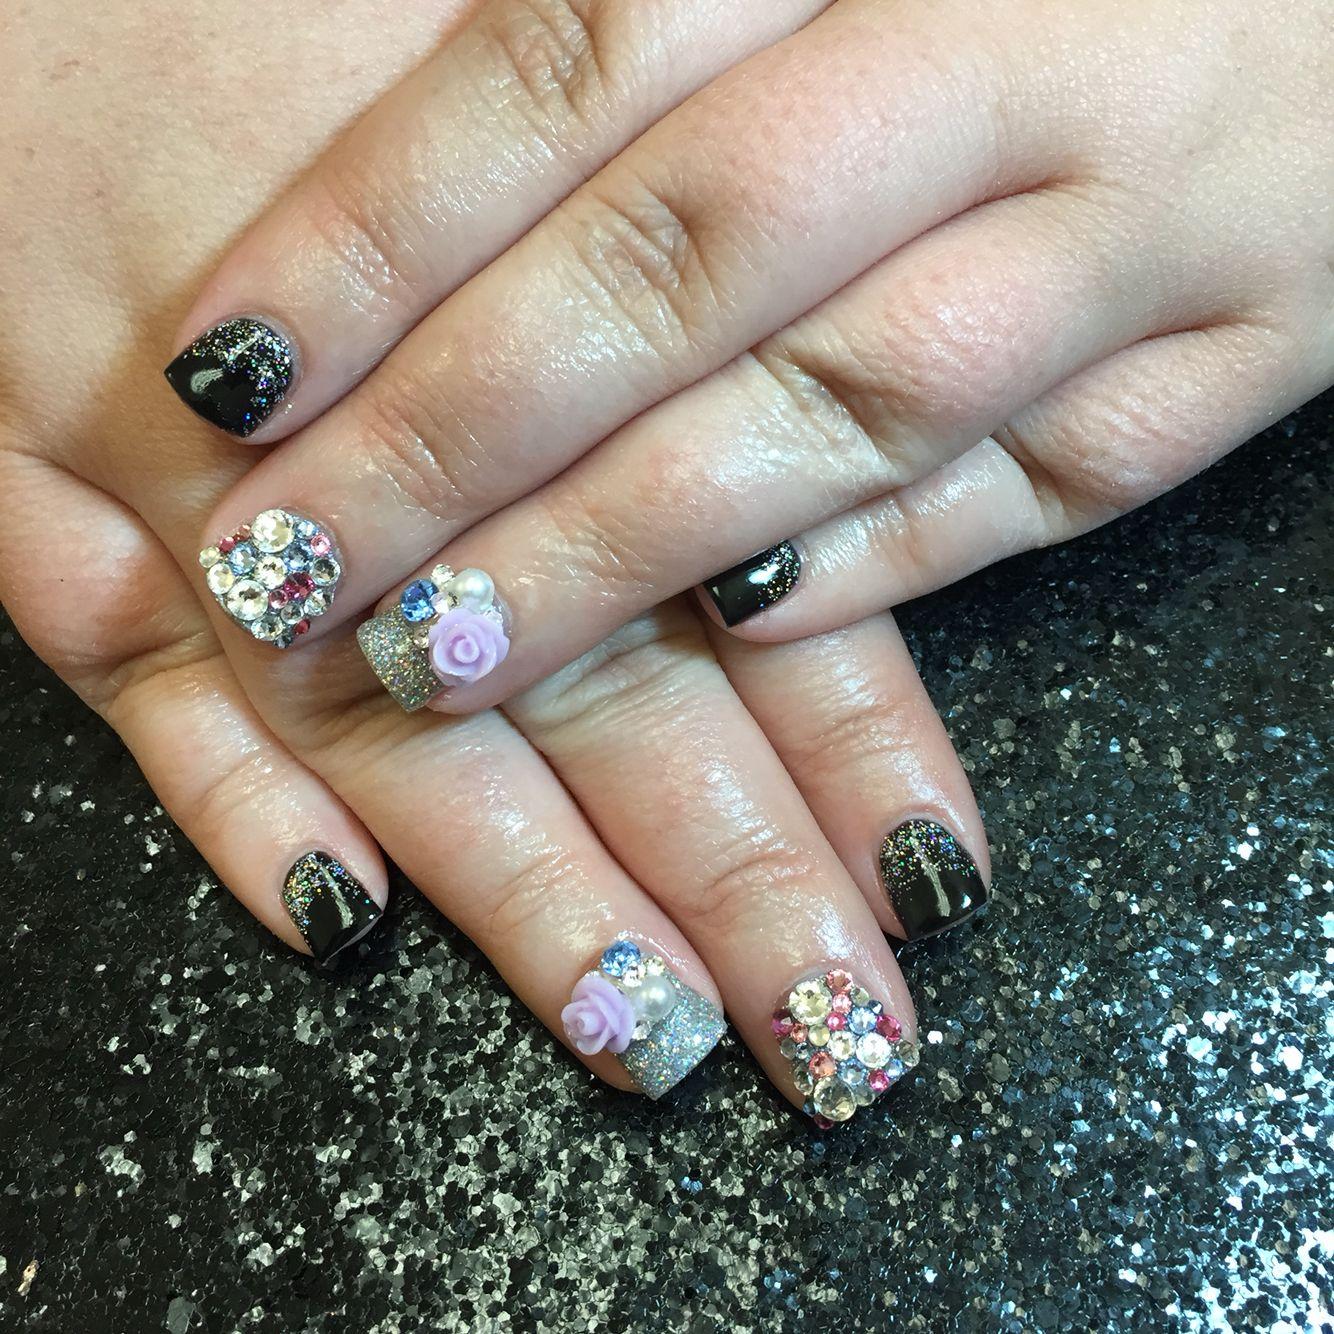 Hellokaylaranaenails Hkrn Nailenthusiast Genuineswarovski Lasvegasnails Lvnails Dopenailsofig Nailtechproble Las Vegas Nails Young Nails Nails Magazine